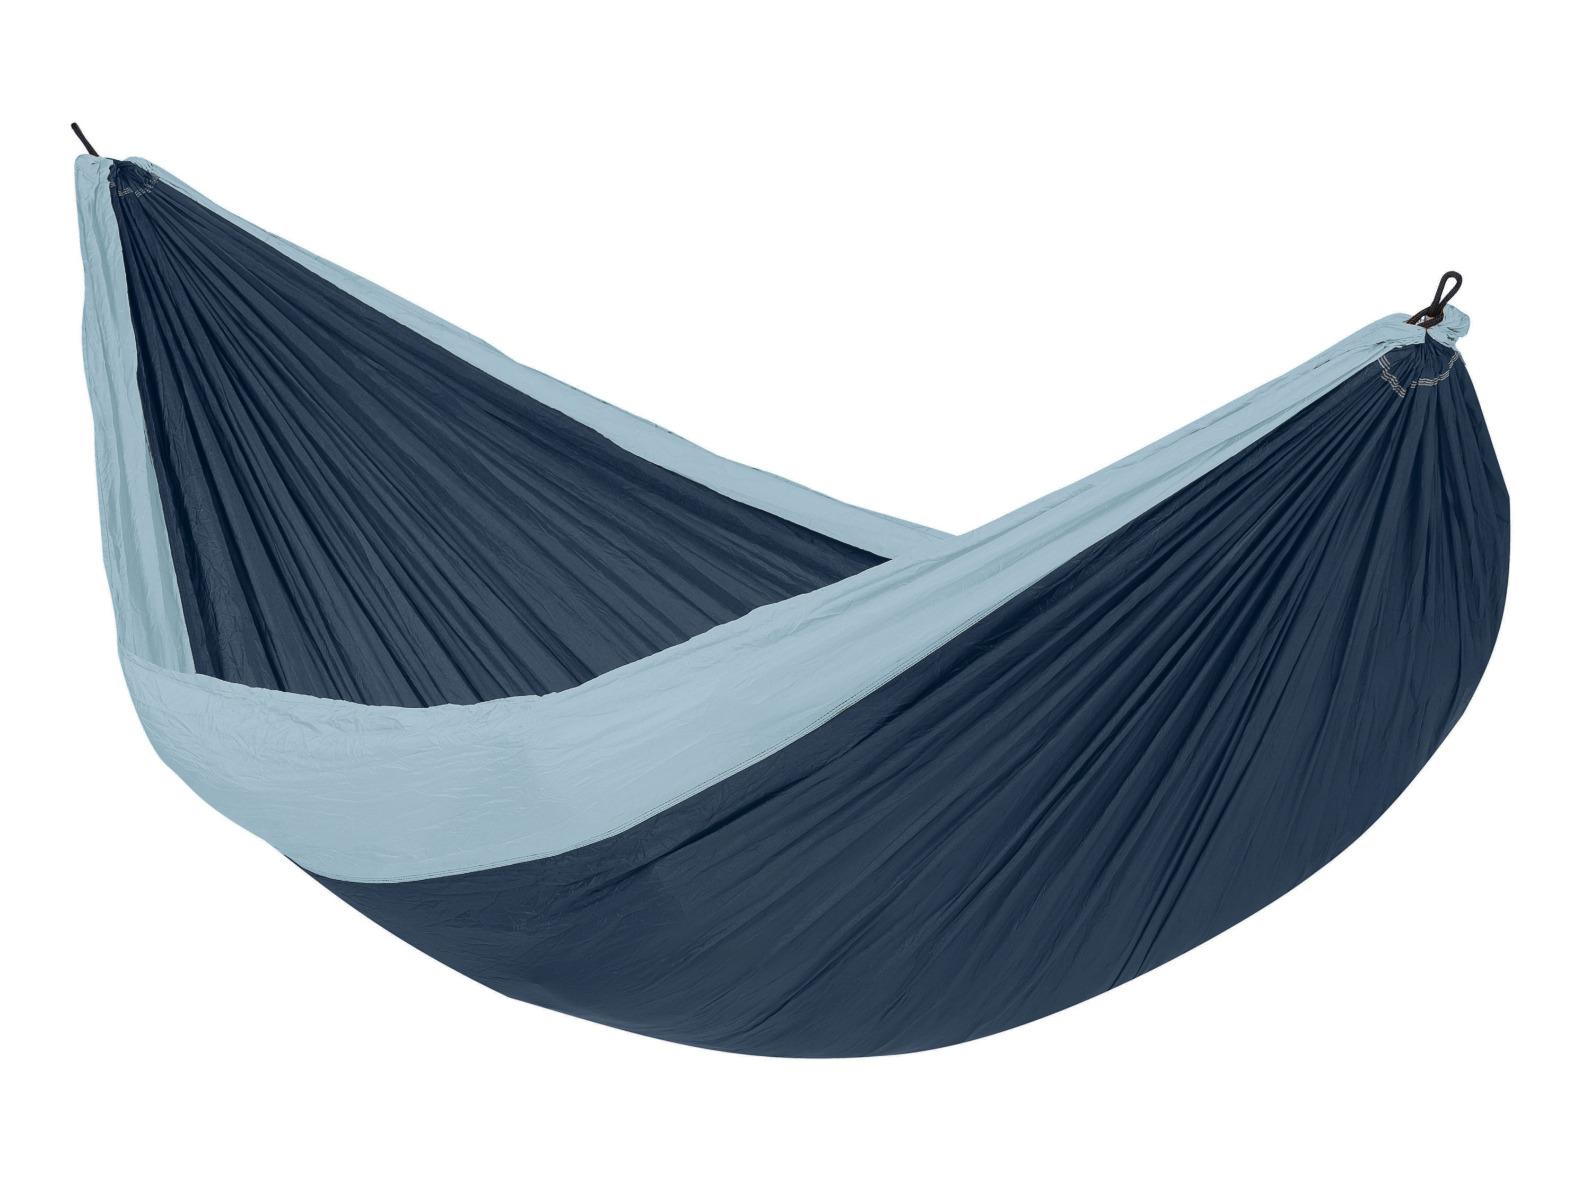 'Outdoor' Mercury E�npersoons Reishangmat - Blauw - Tropilex �